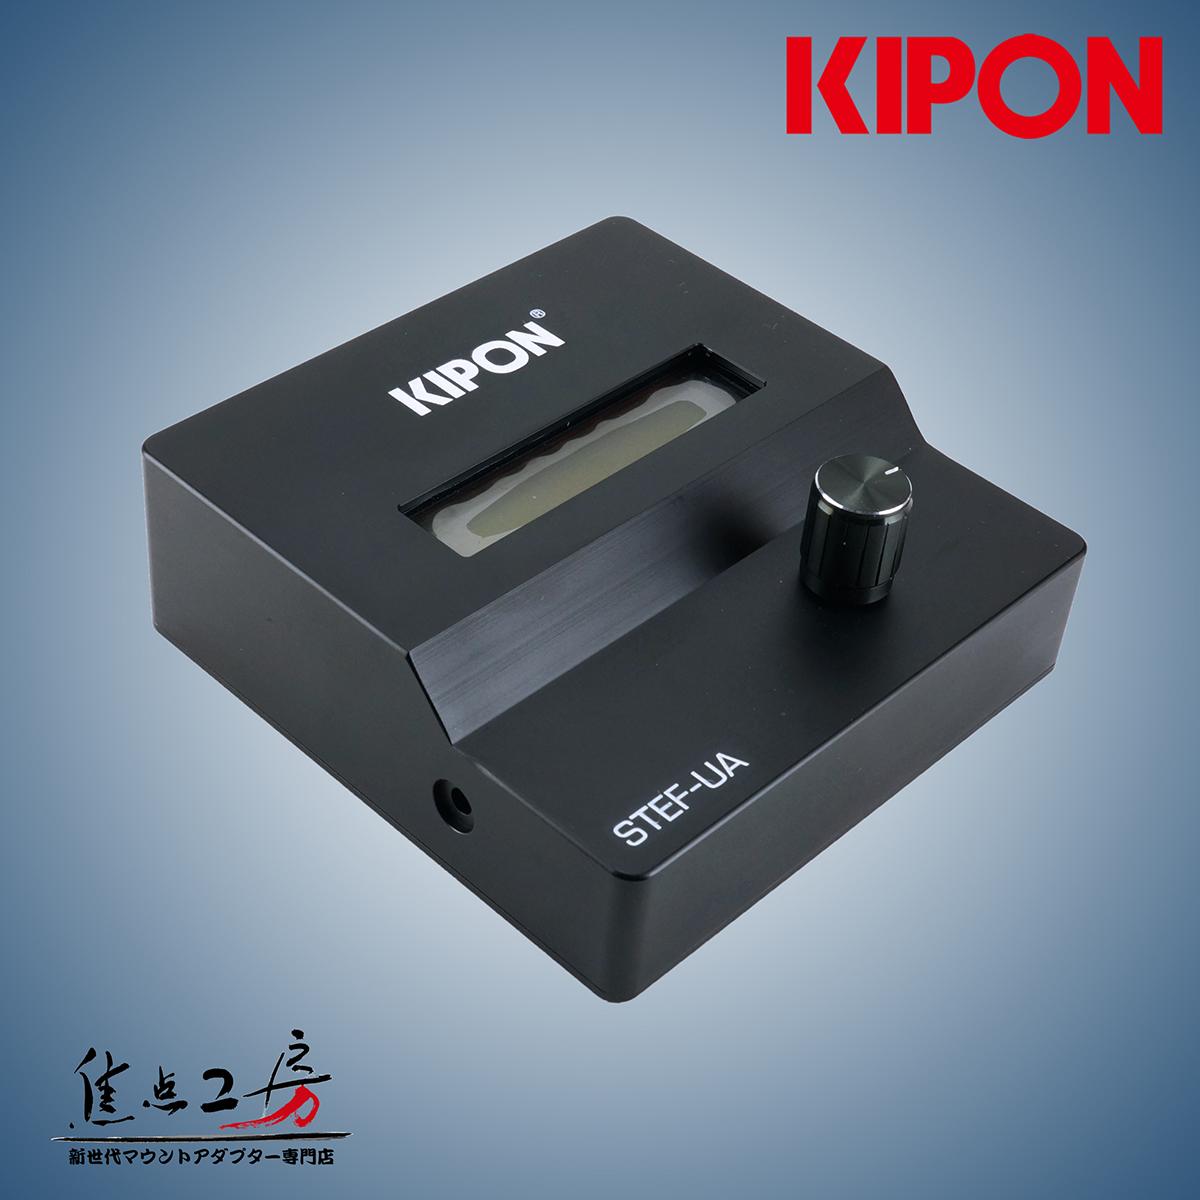 KIPON(キポン) STEF-UAリモートコントローラー